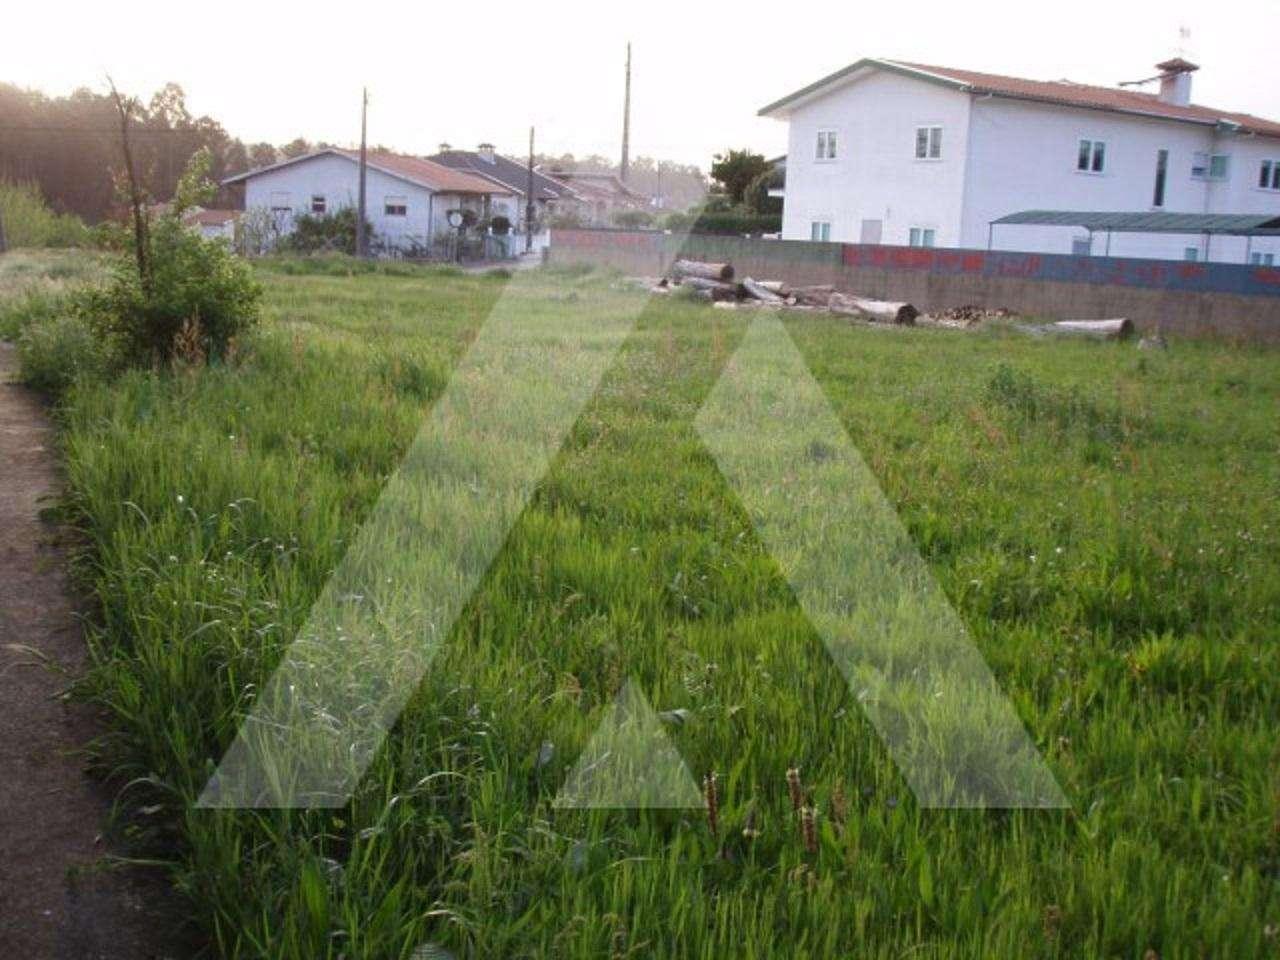 Terreno para comprar, Milheirós de Poiares, Aveiro - Foto 2